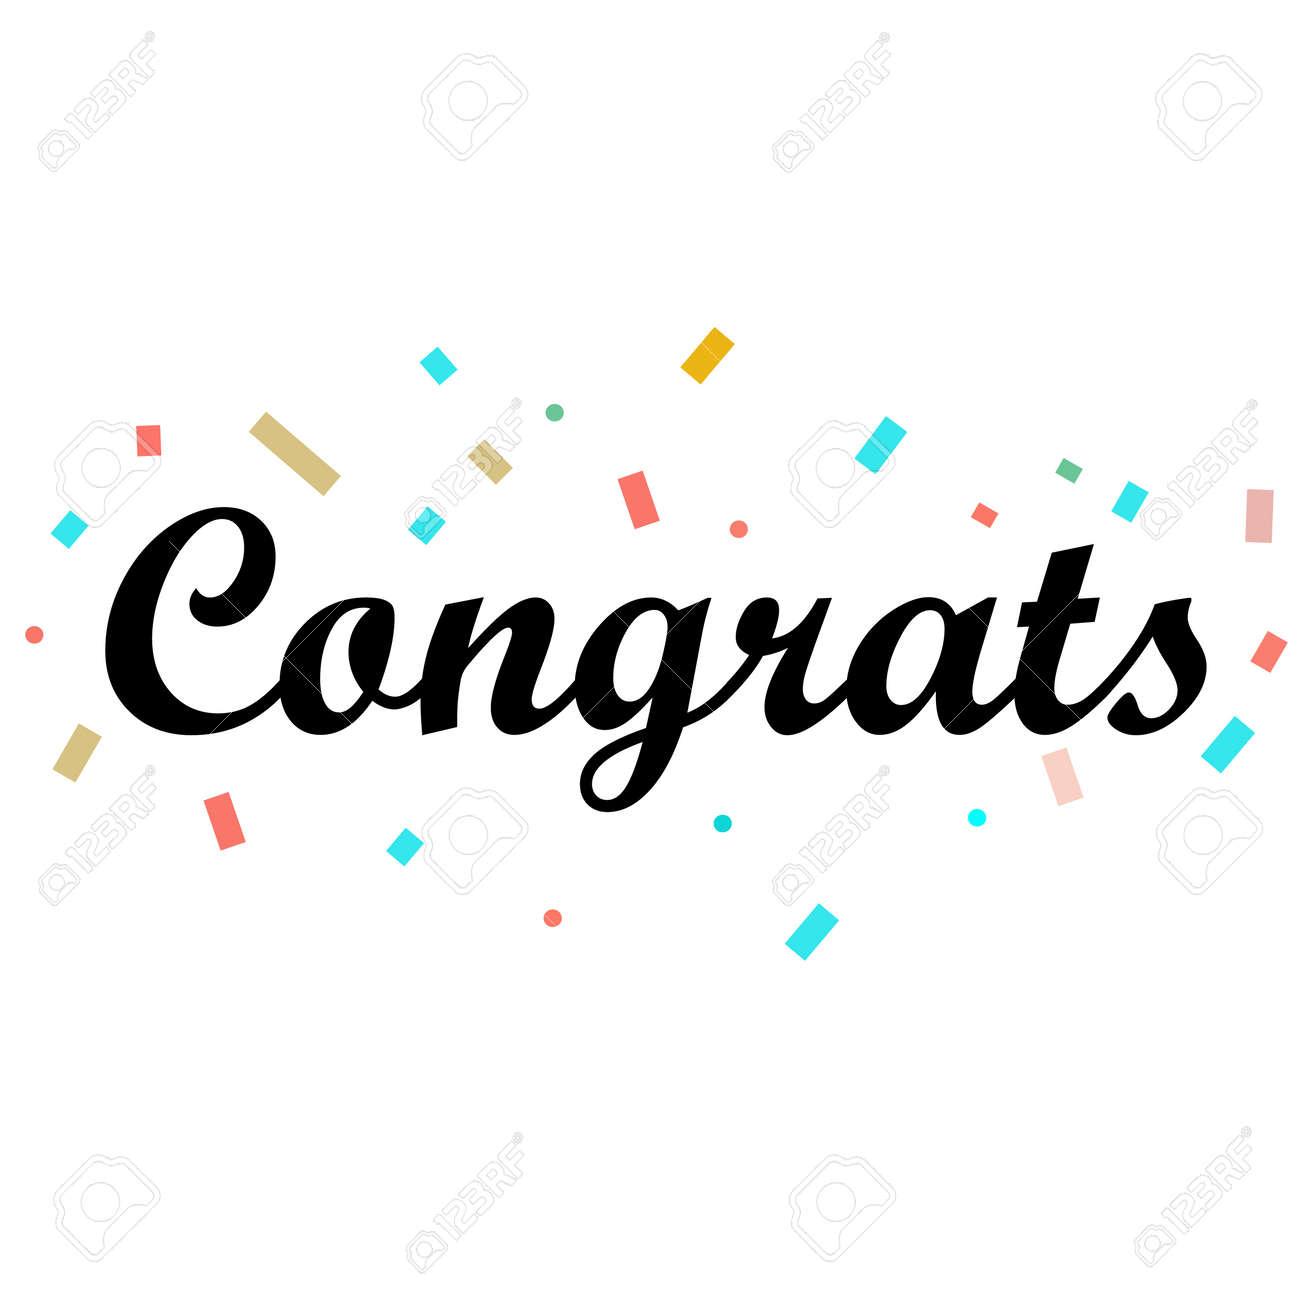 Congrats Letter on white background. Congrats lettering text. Congrats calligraphy lettering. Template for logotype, design, logo, app, UI, badge, card, postcard. - 168872724